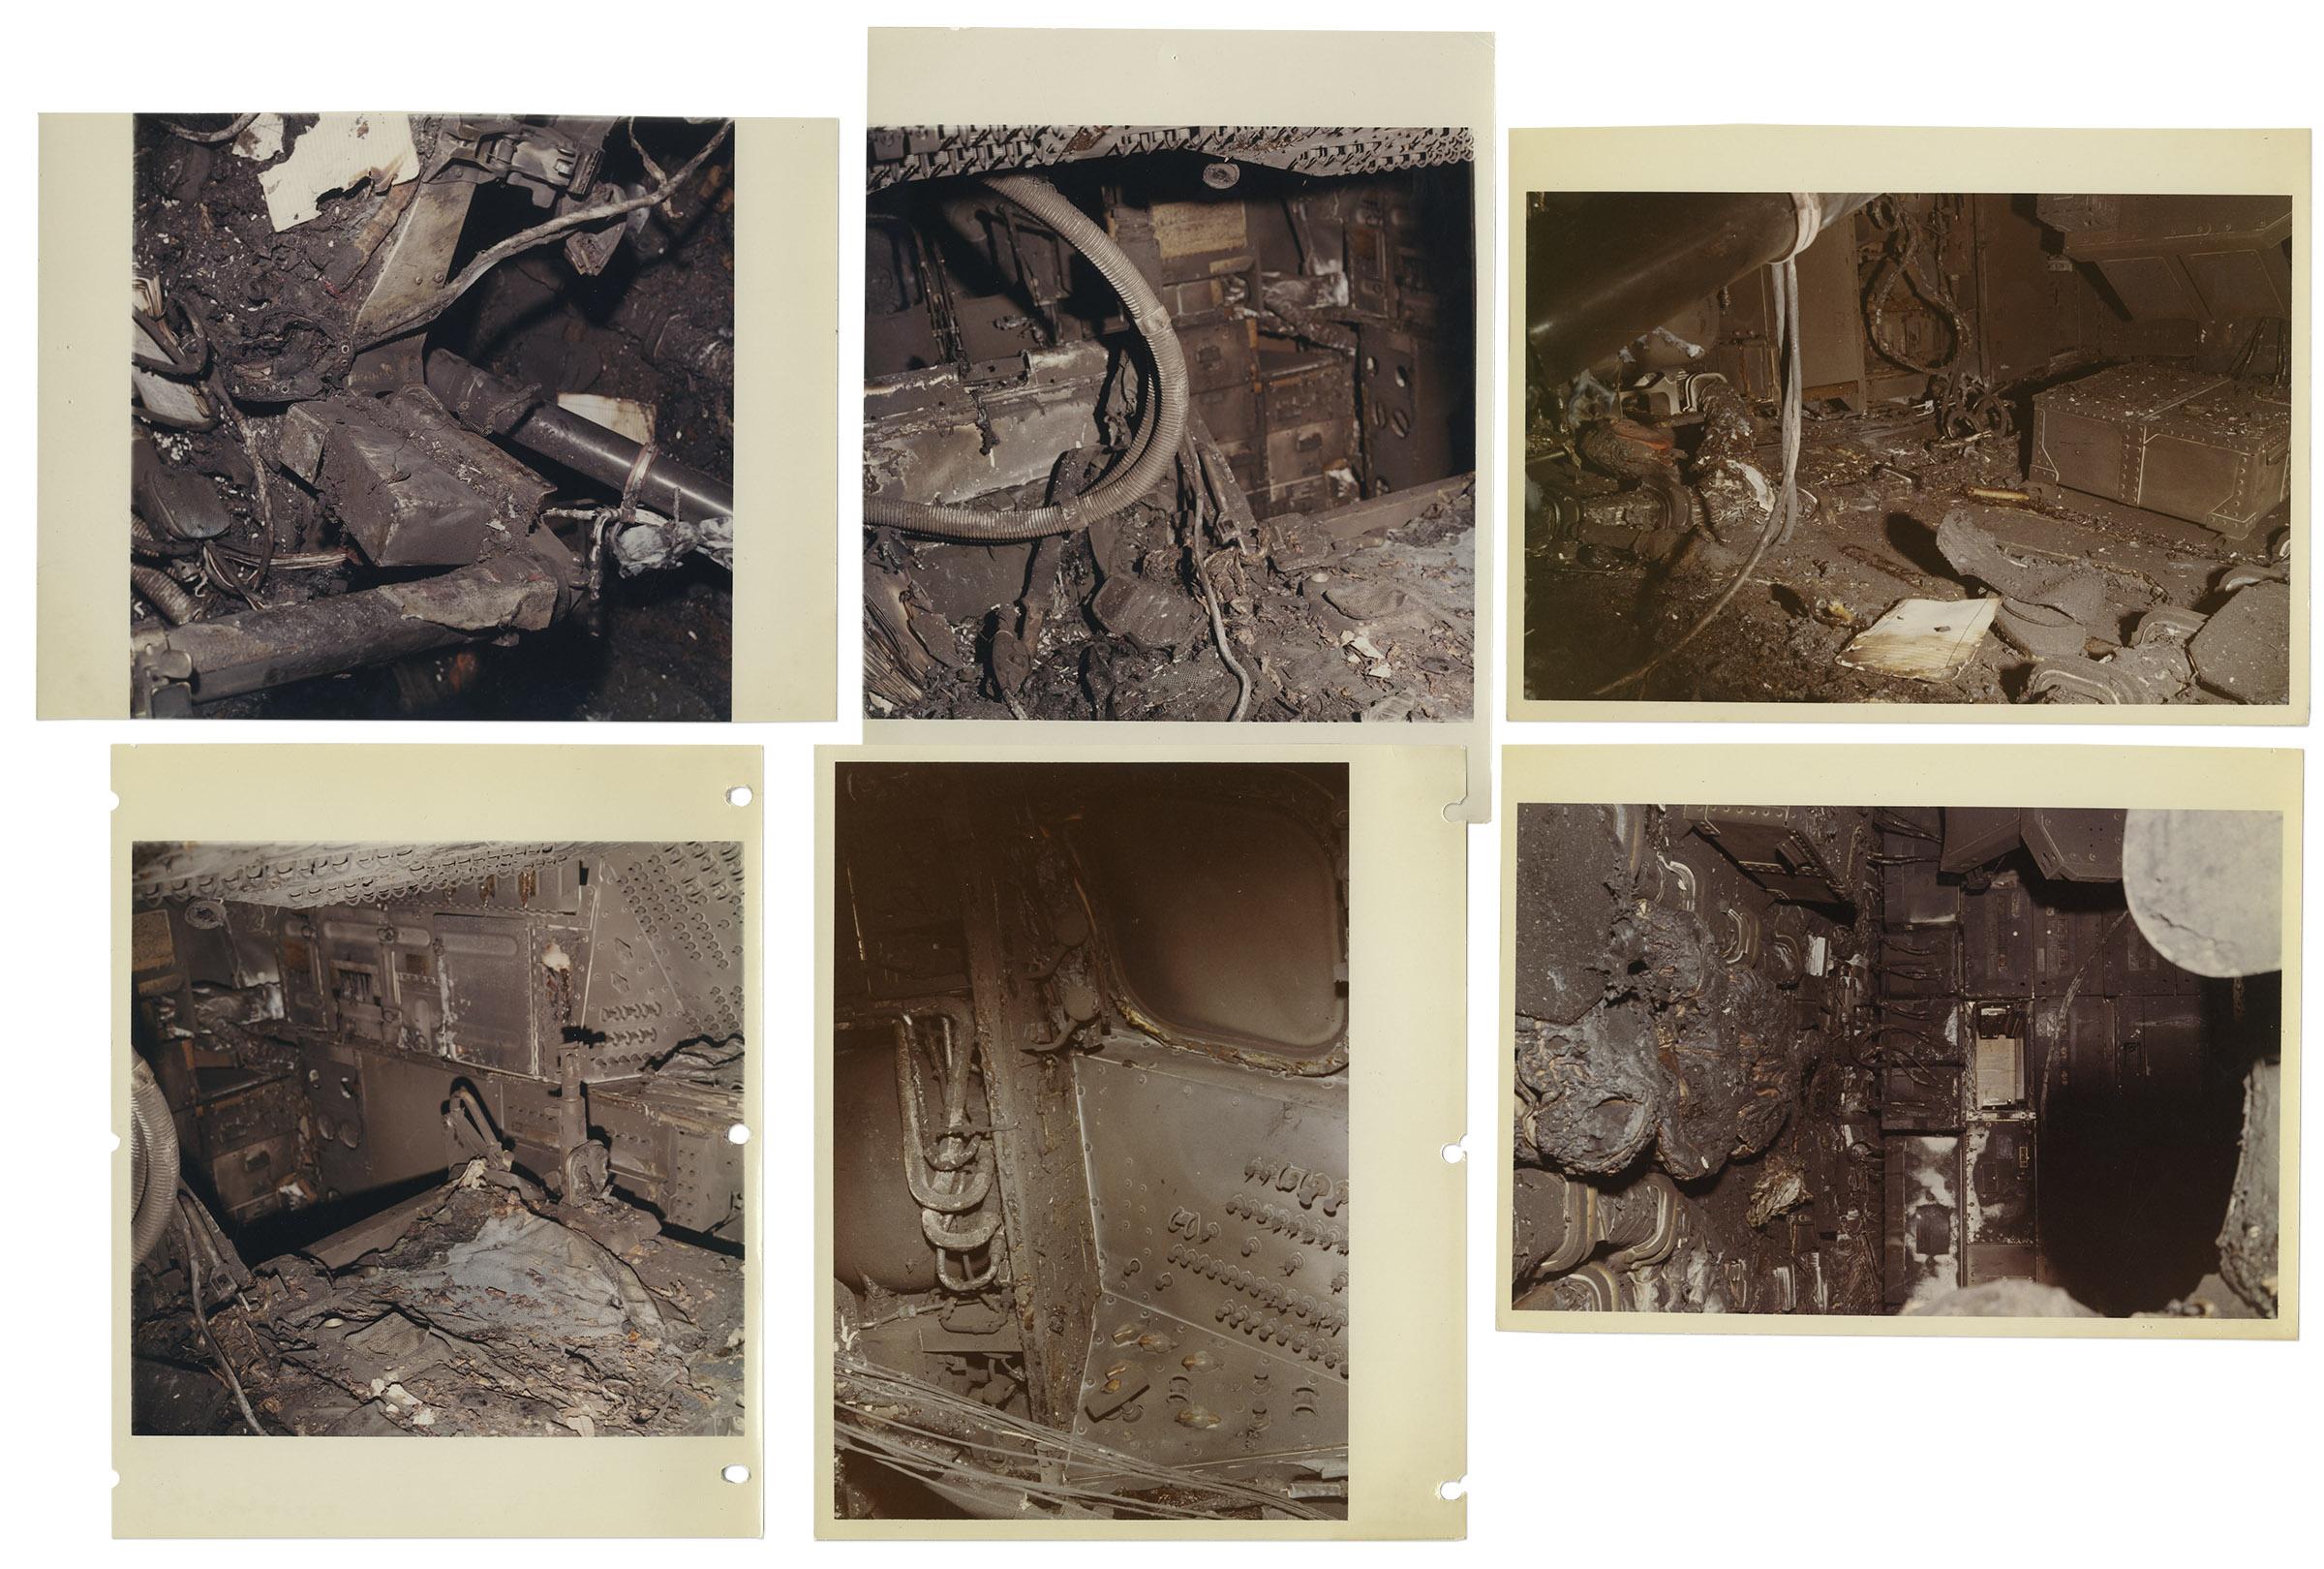 Apollo 1 Fire – HD Wallpapers